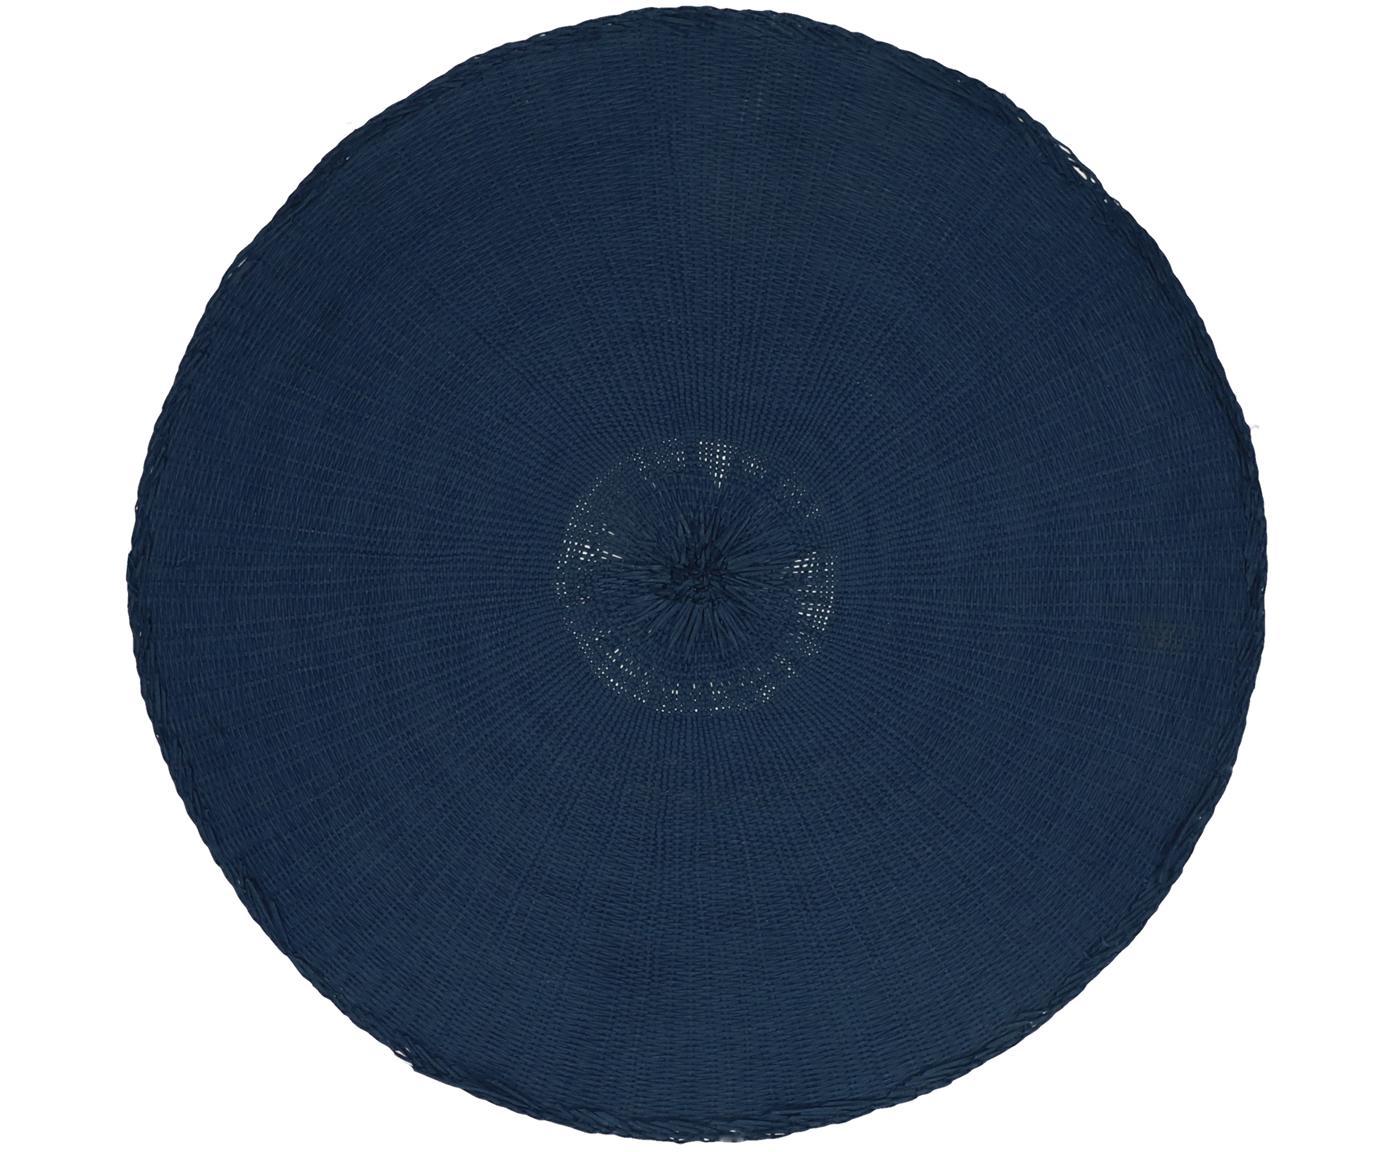 Ronde placemats Kolori, 2 stuks, Papiervezels, Blauw, Ø 38 cm